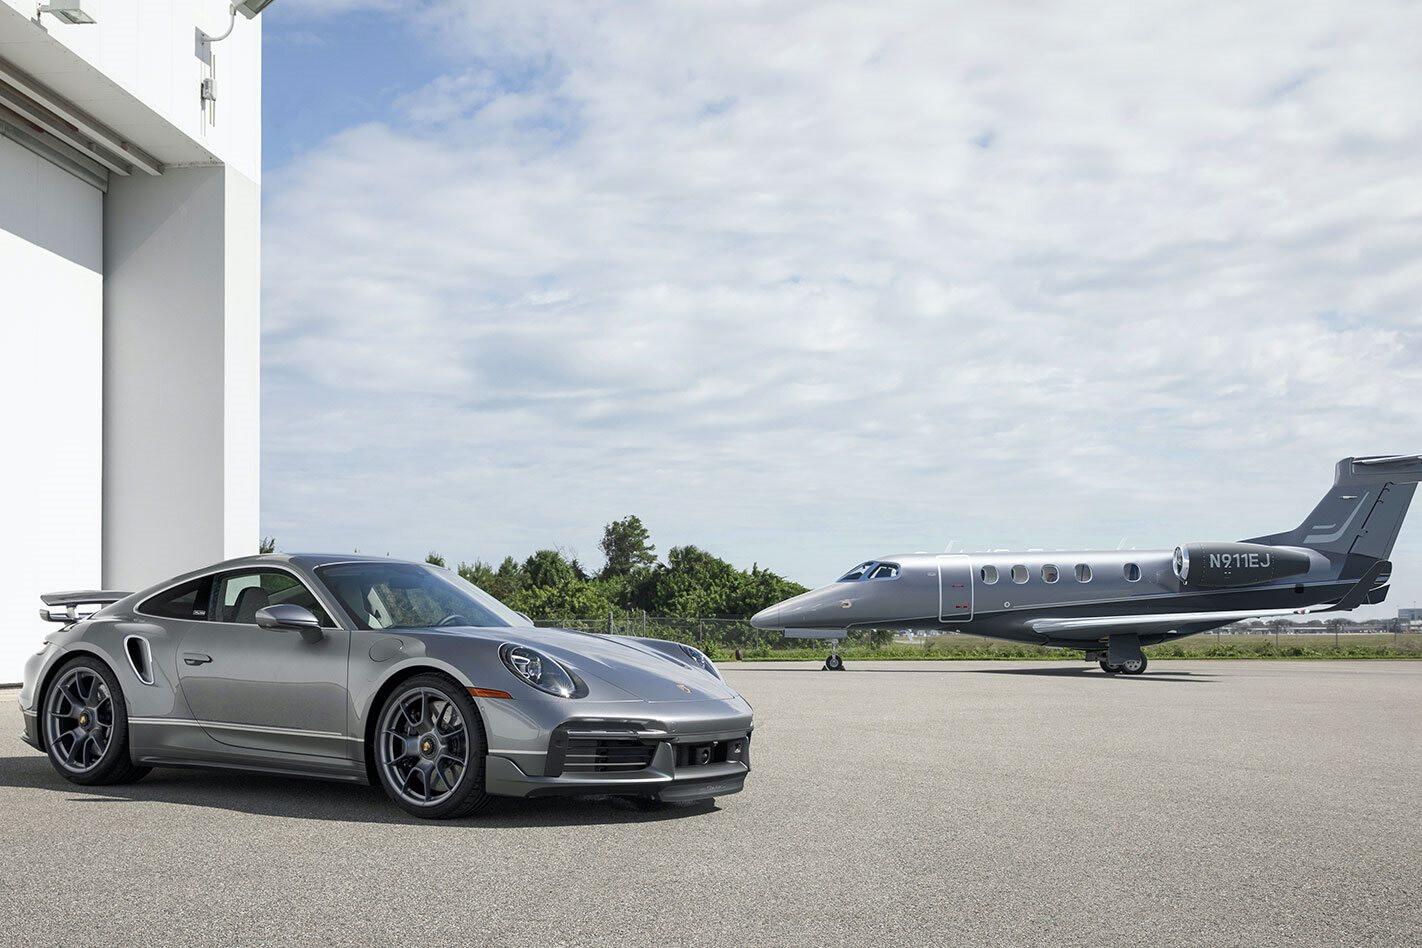 2020 Porsche 911 Turbo S Embraer